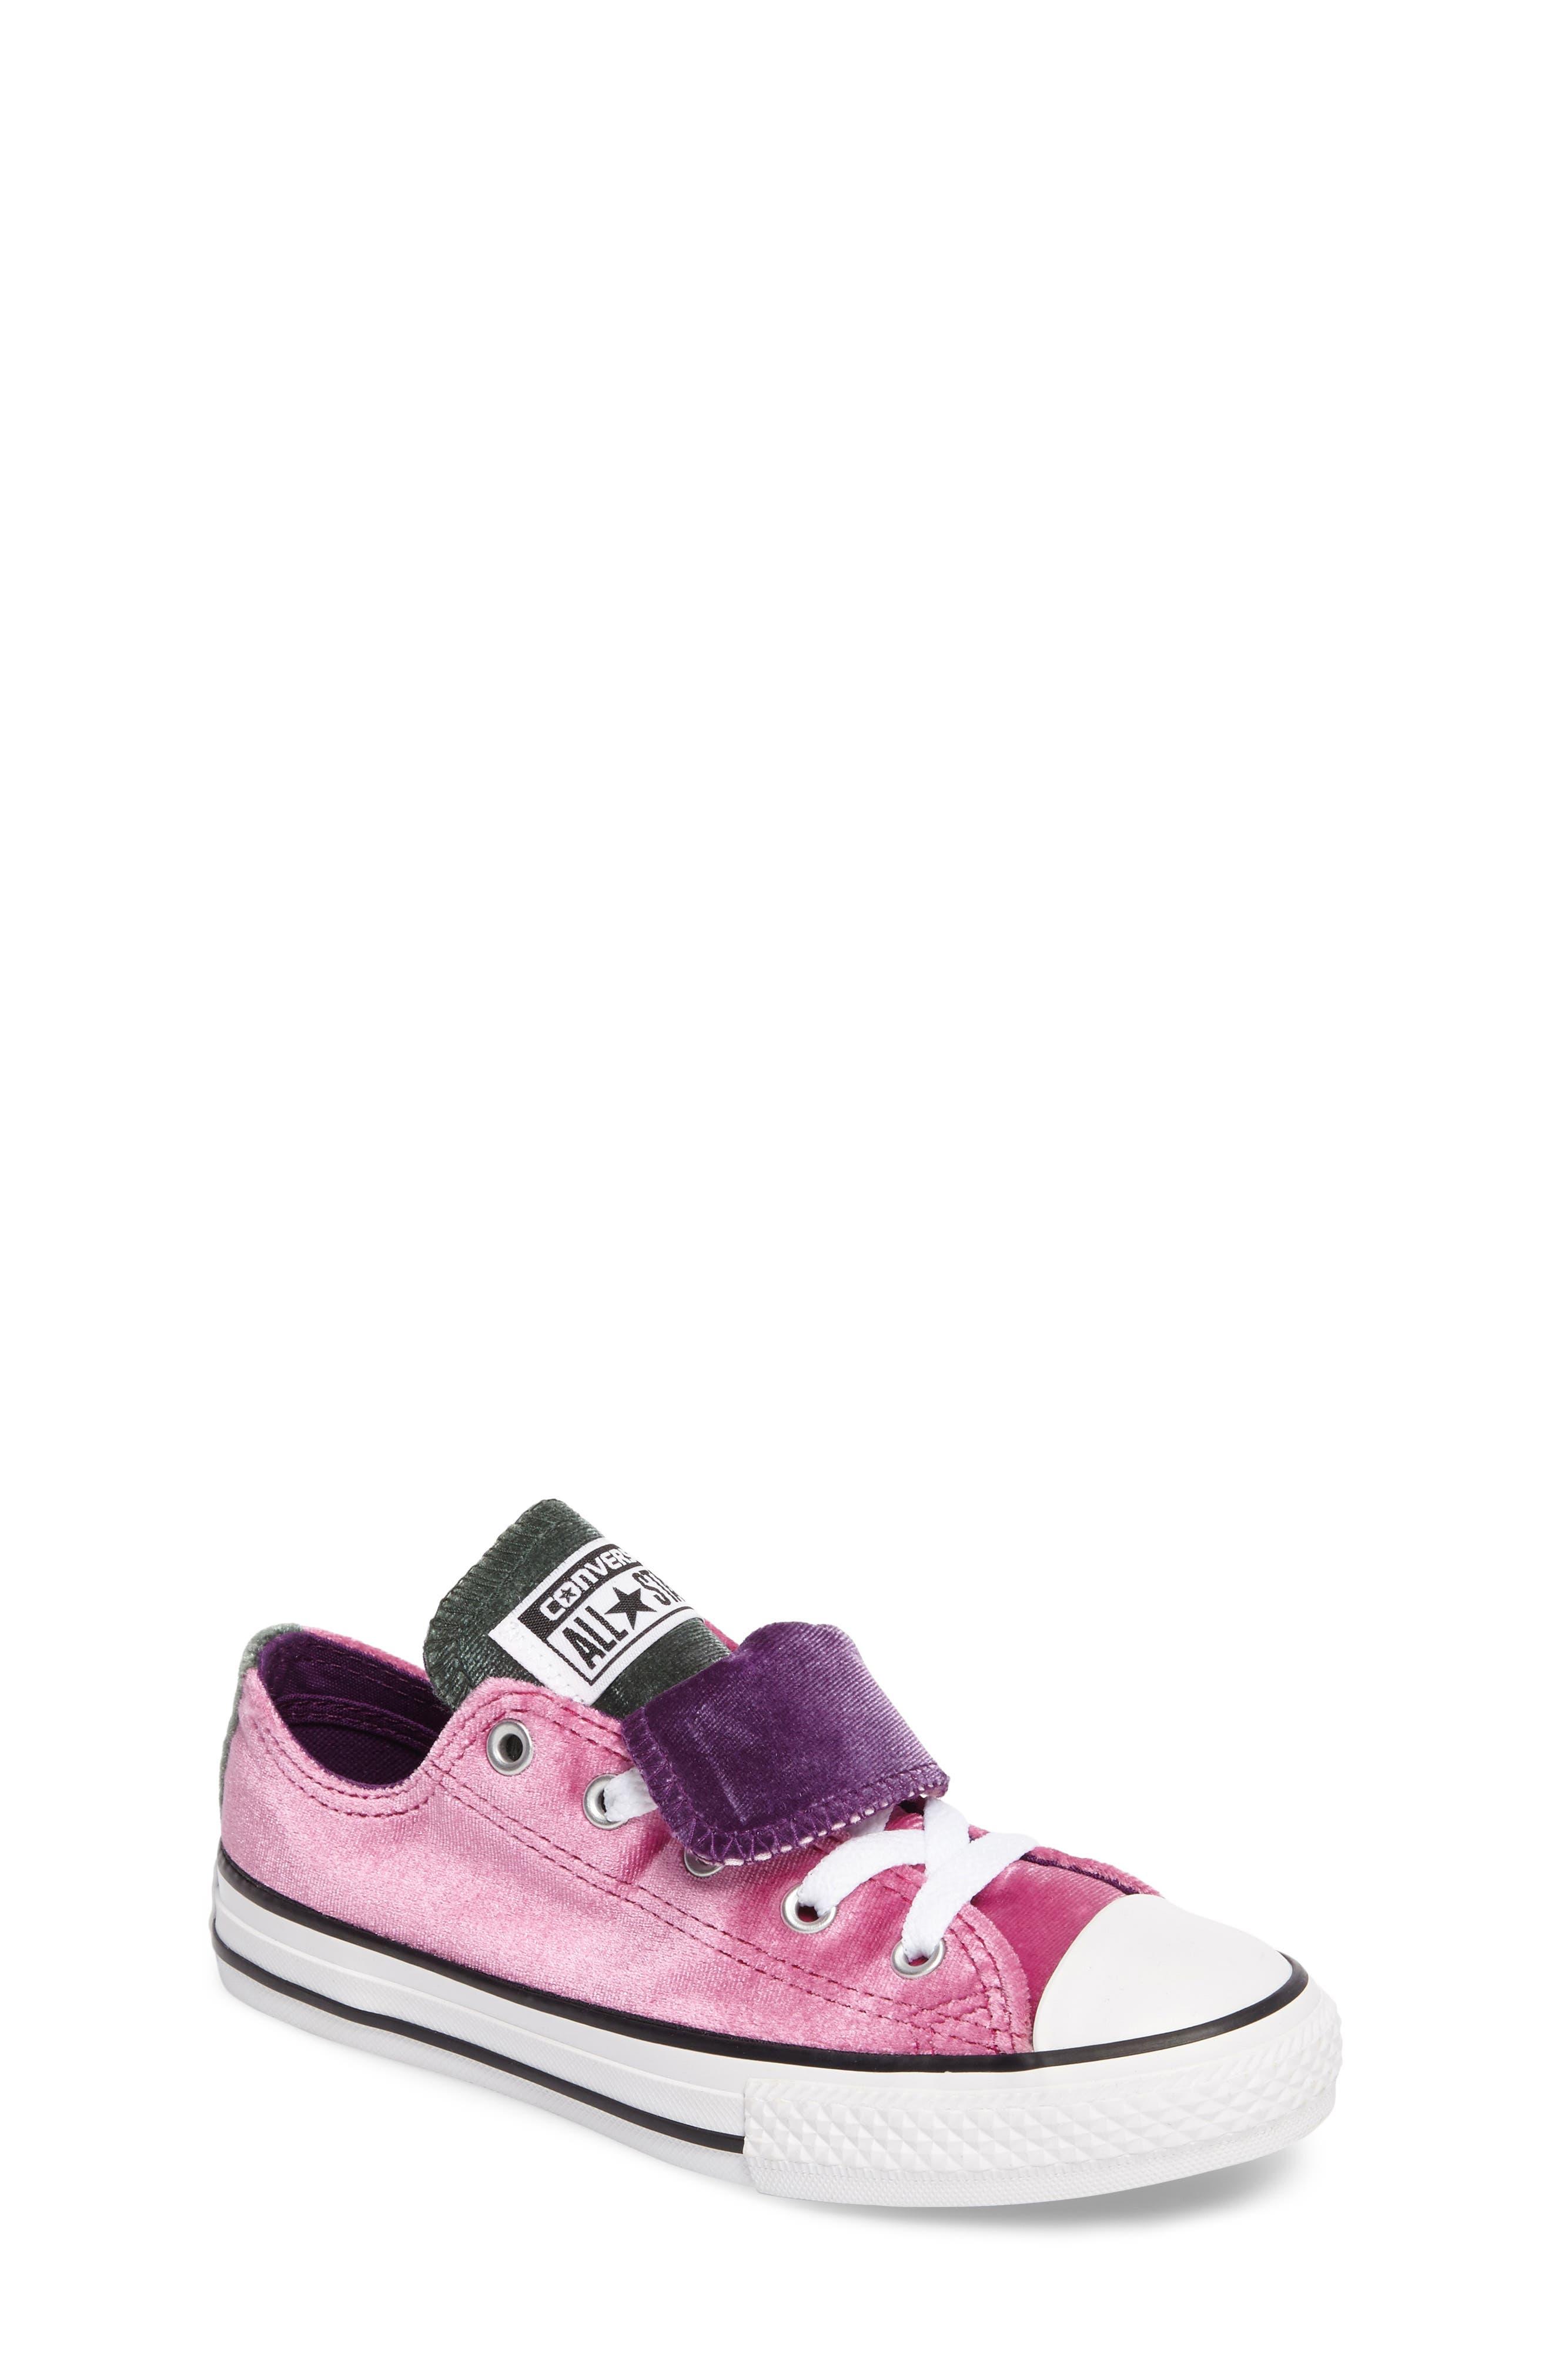 Converse All Star® Velvet Double Tongue Sneaker (Toddler, Little Kid & Big Kid)